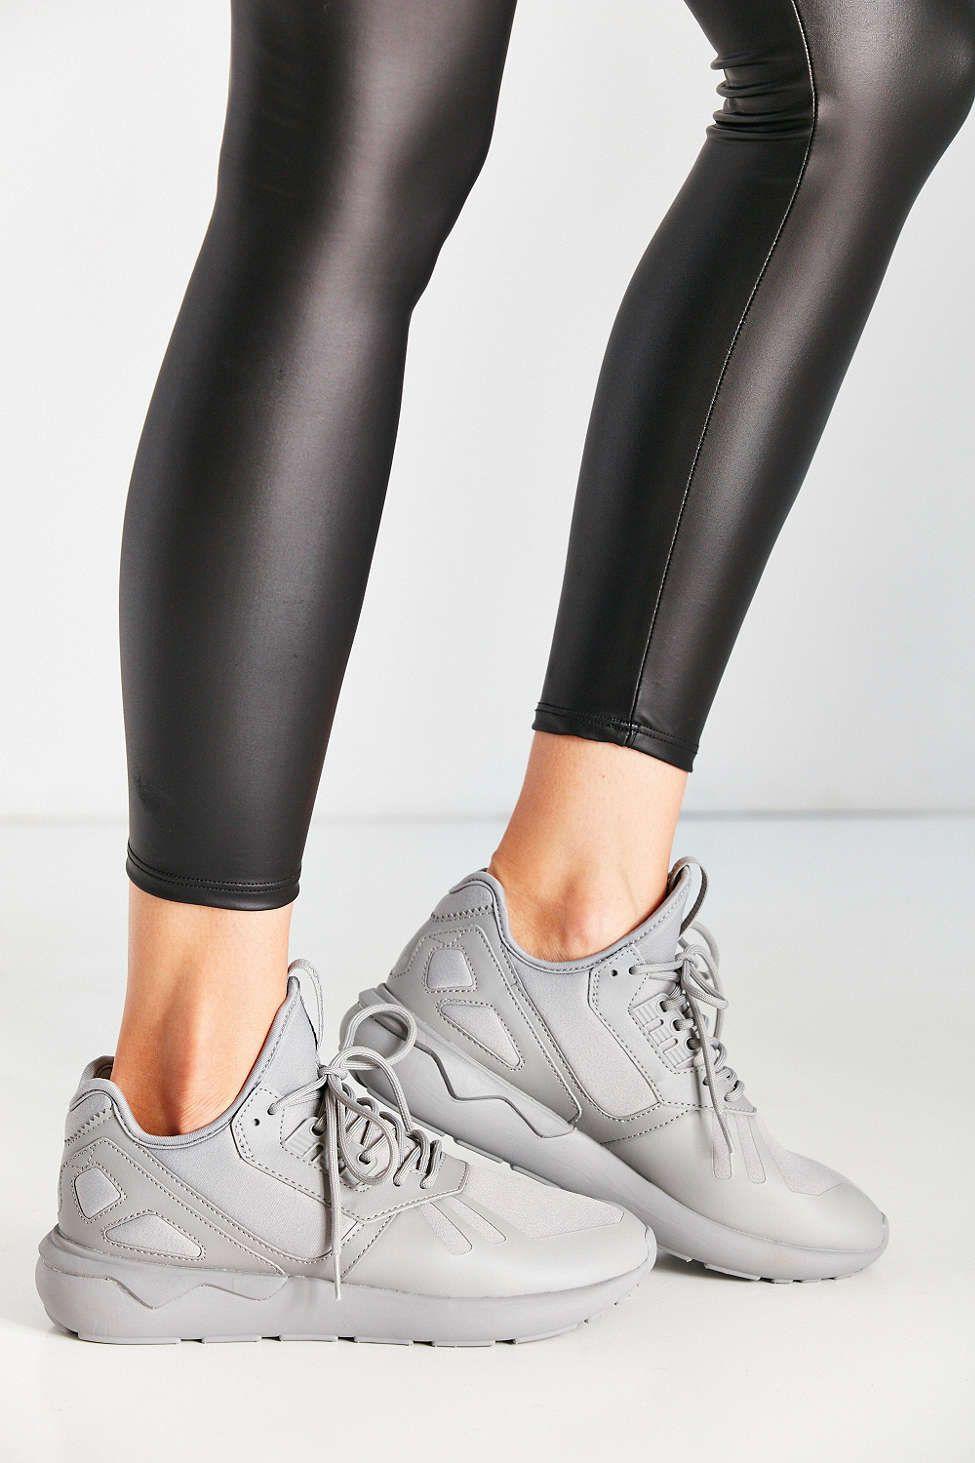 adidas originali mono tubulare scarpe adidas, sito web e originali.